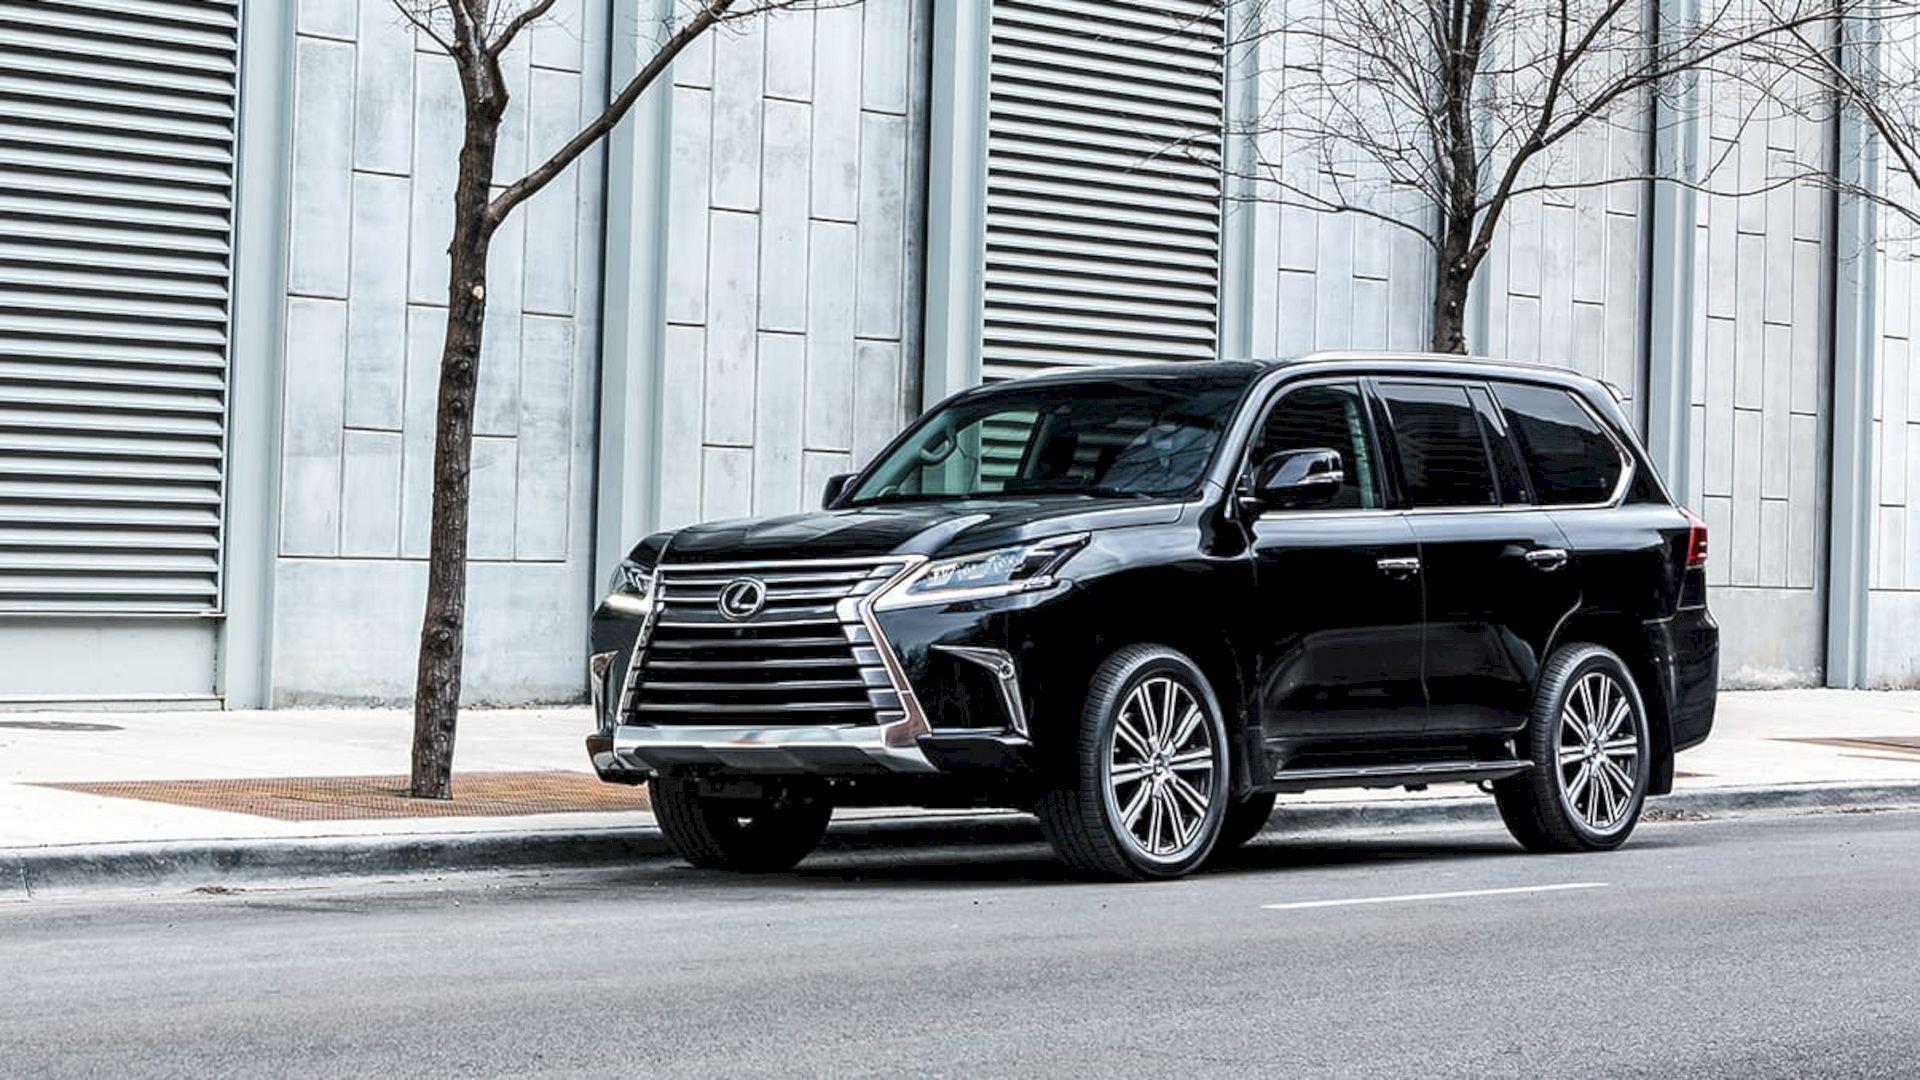 2019 Lexus LX 570: Changes, Equipment, Price >> 2019 Lexus Lx 570 Crafted To Command Badass Car Designs